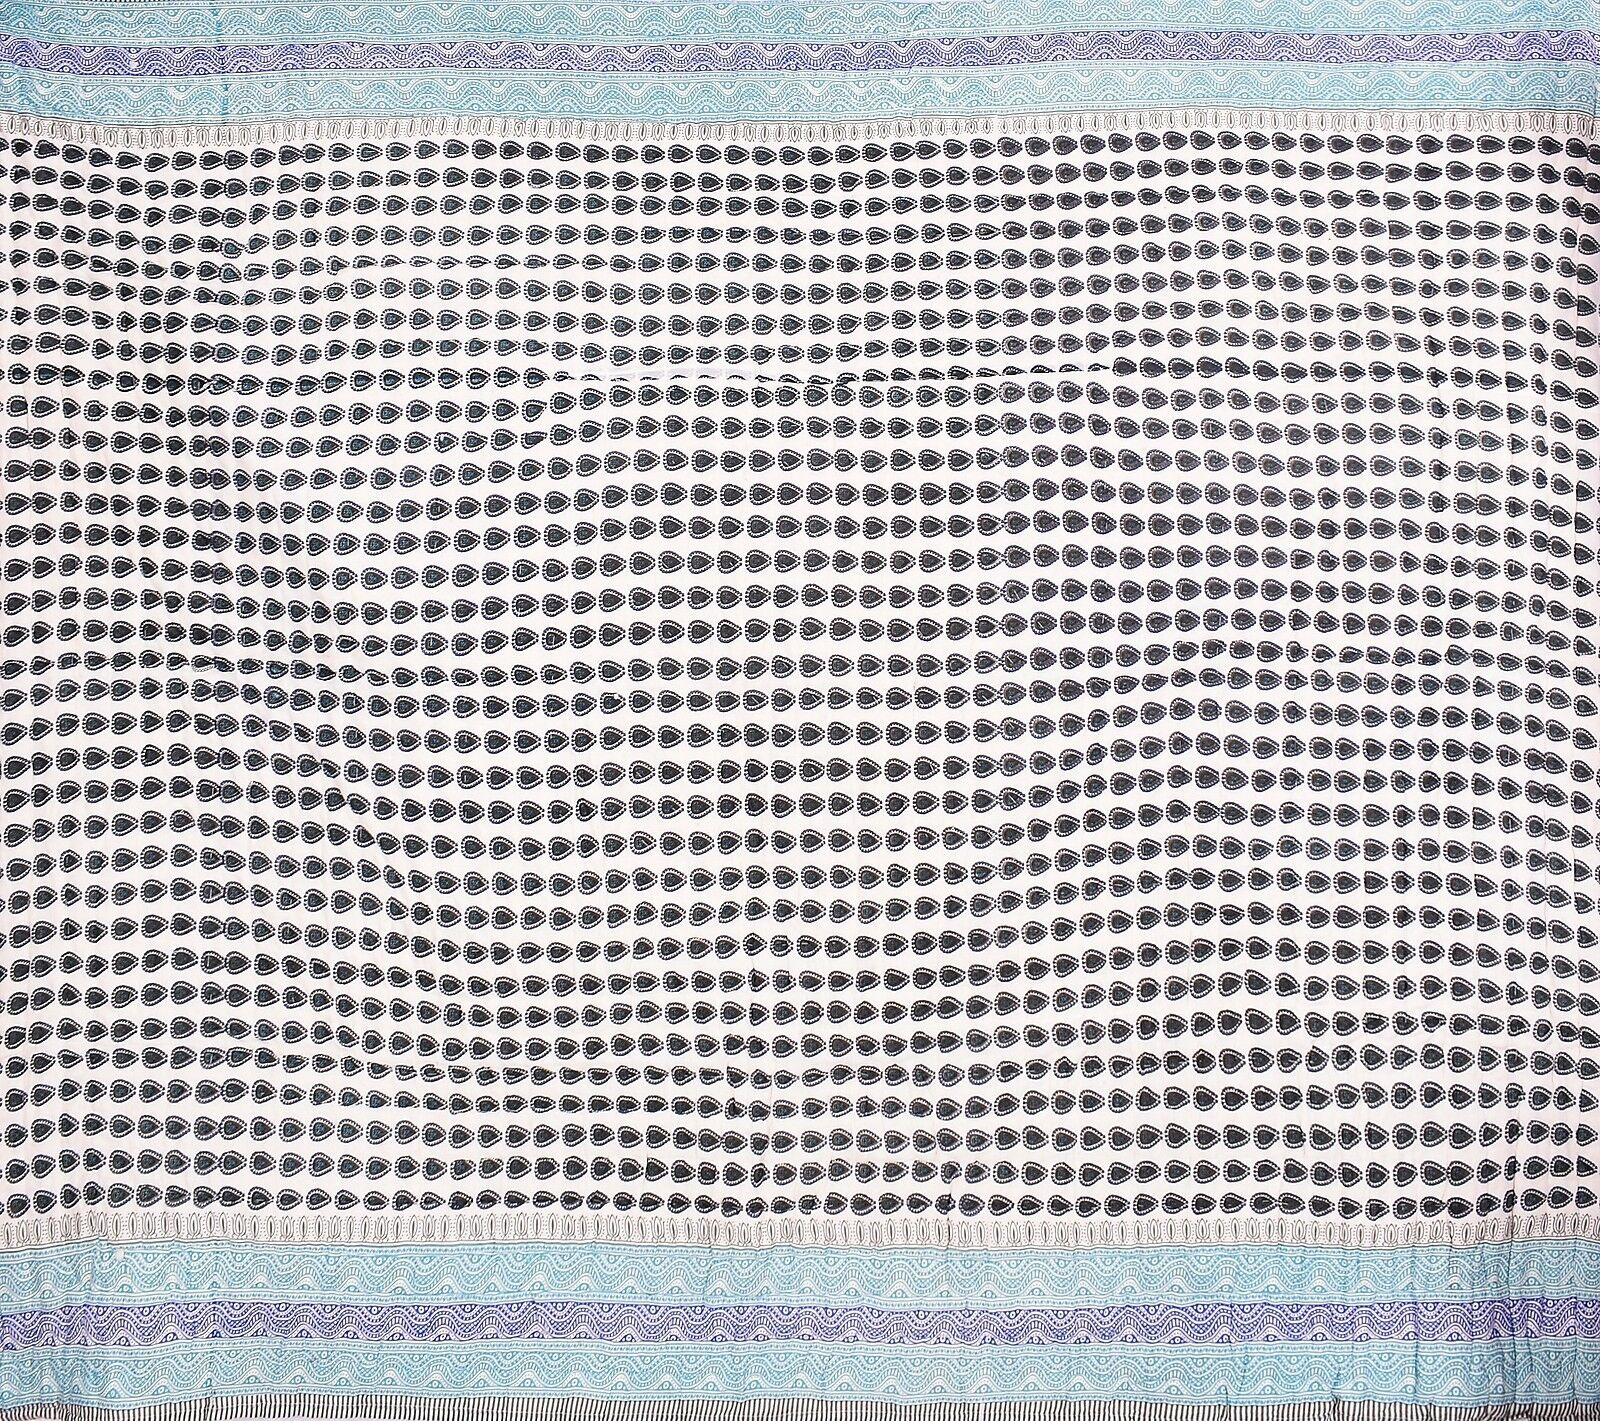 Indian Quilt Quilt Quilt Cotton Queen Größe Rajai Quilted Floral Blanket Bohemian Comforter 41a280